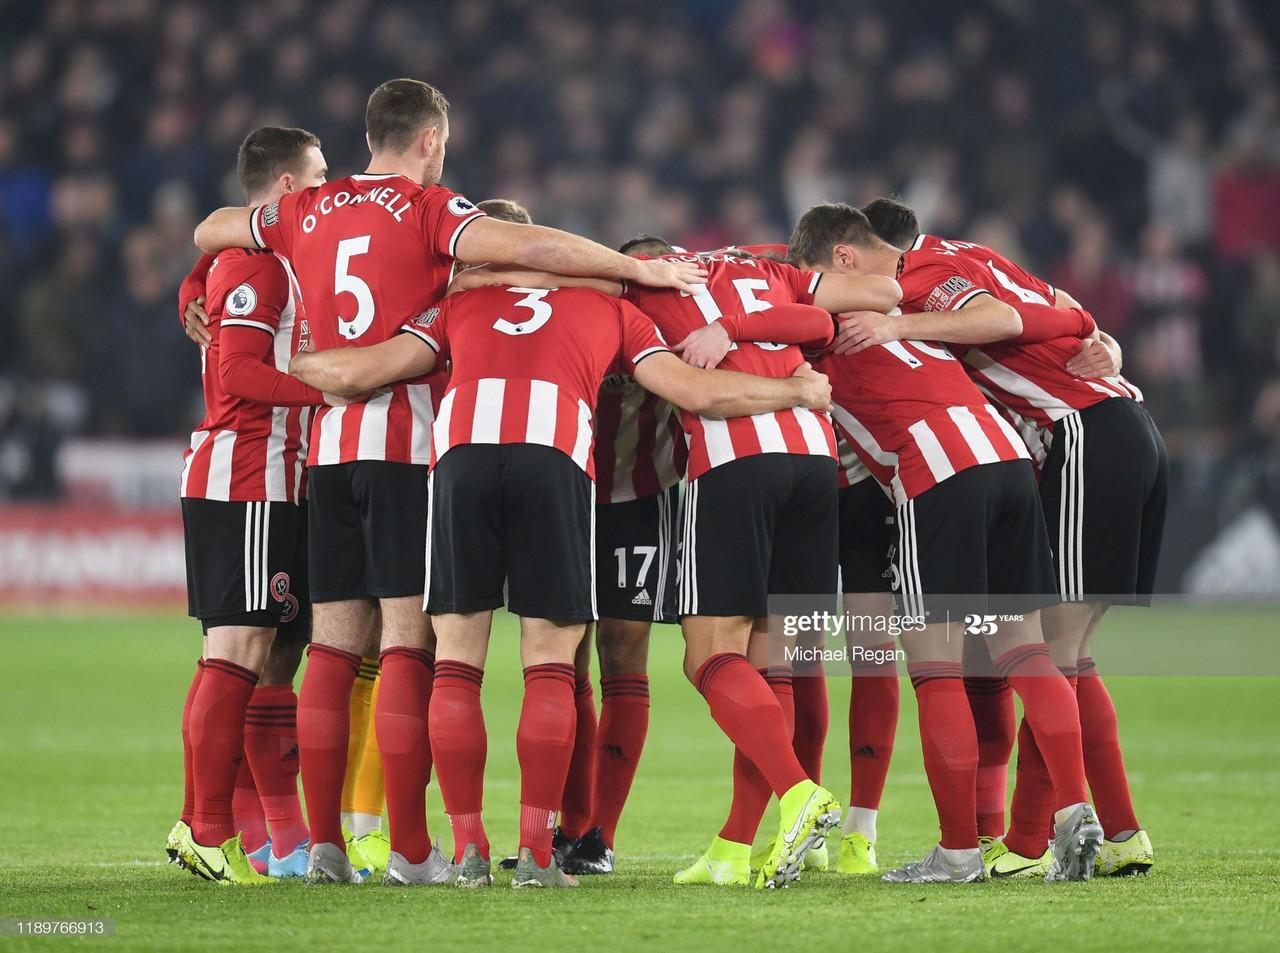 Sheffield United 2019/20 season review: Back with a bang